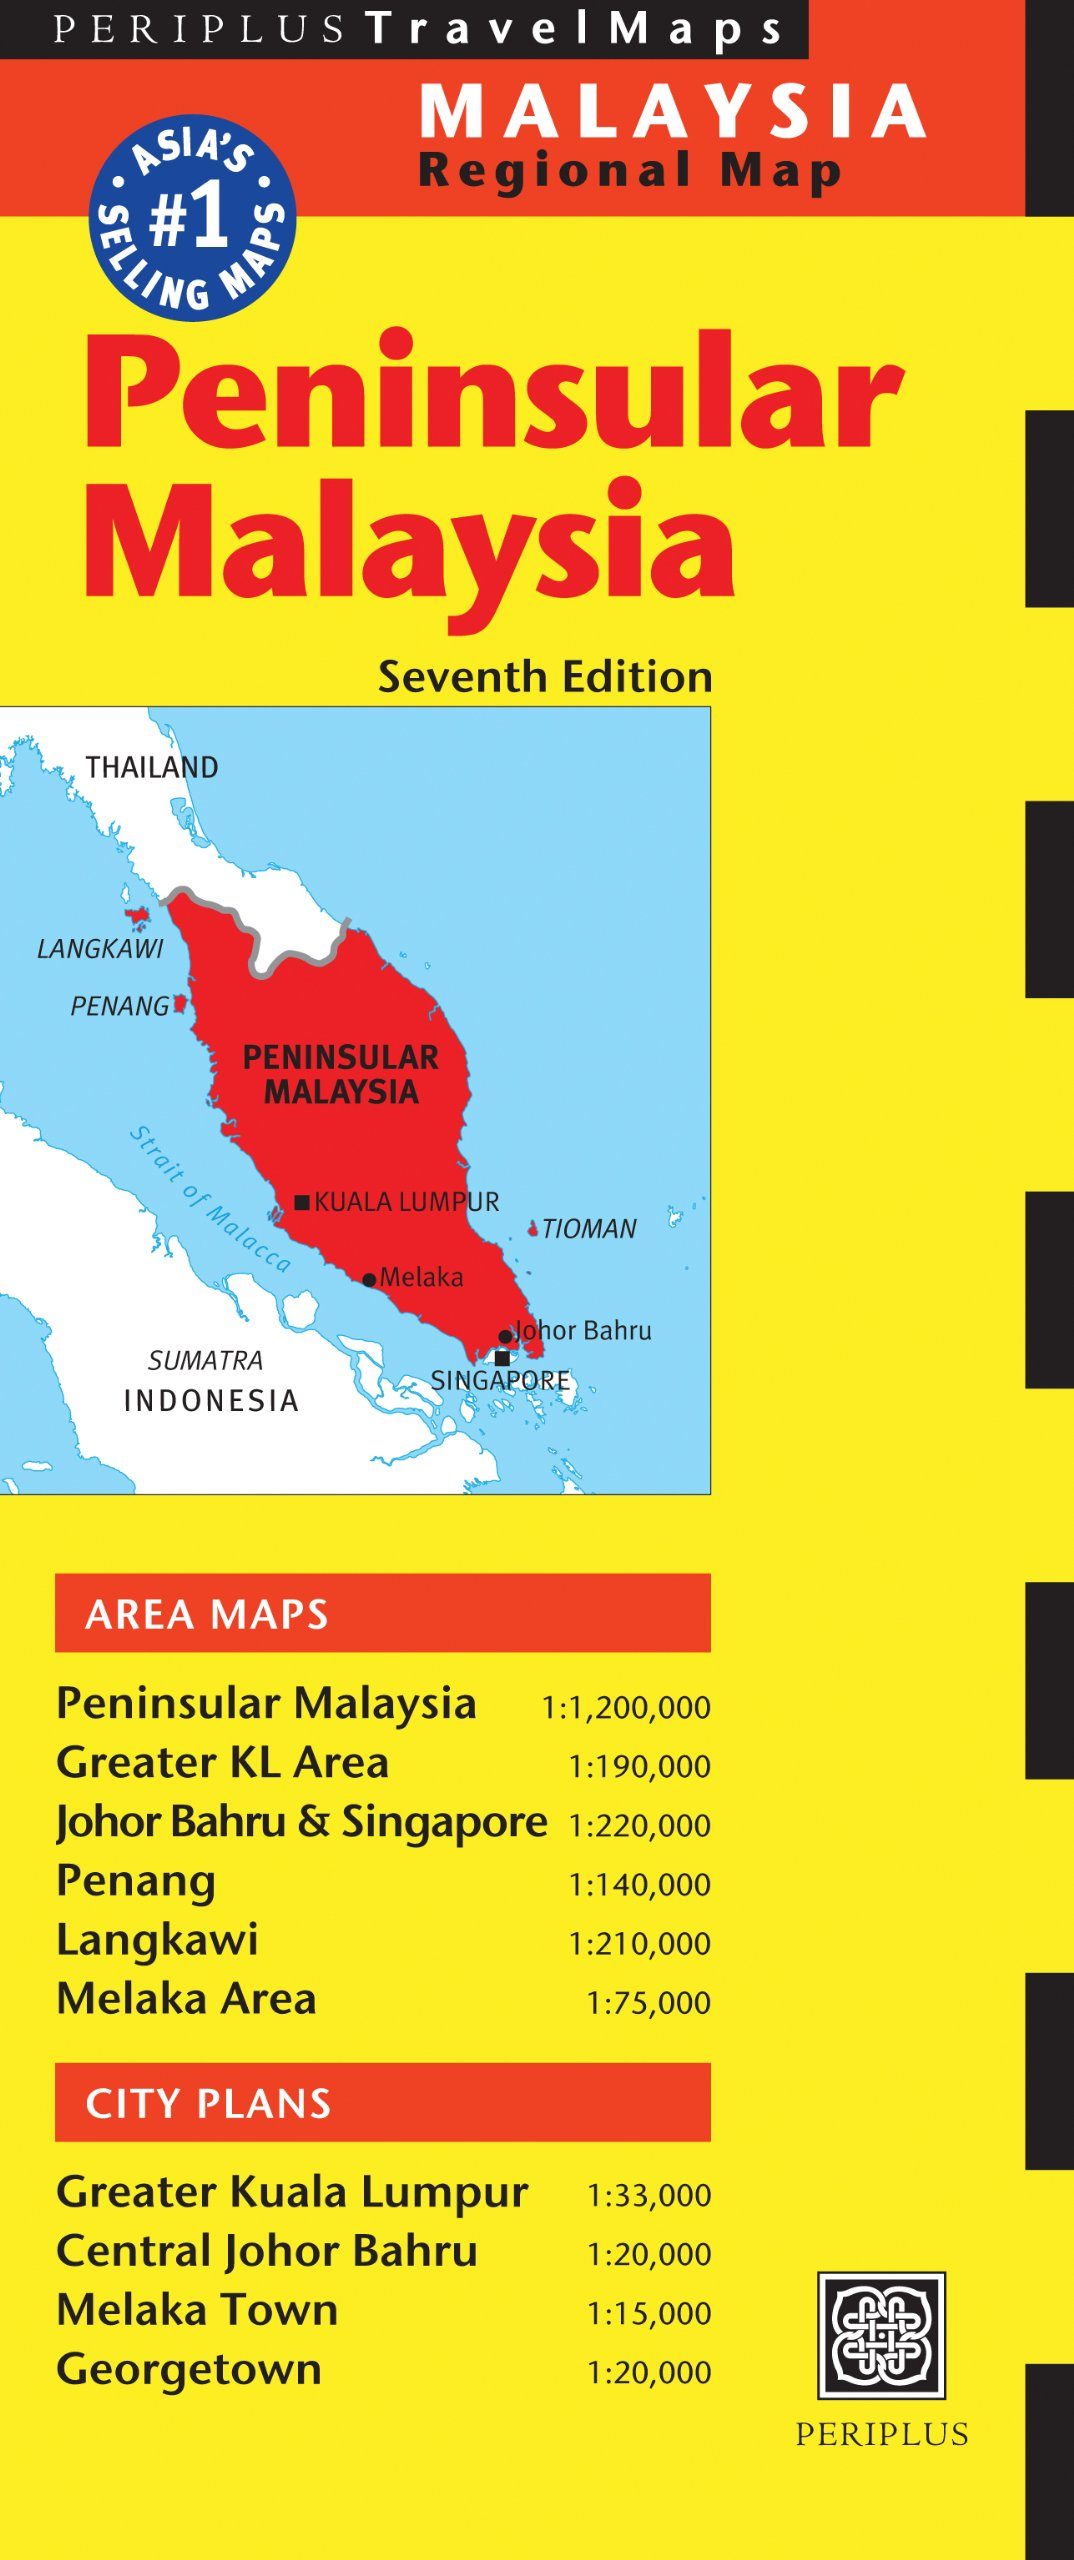 Peninsular Malaysia Travel Map Seventh Edition (Periplus Travel Maps)